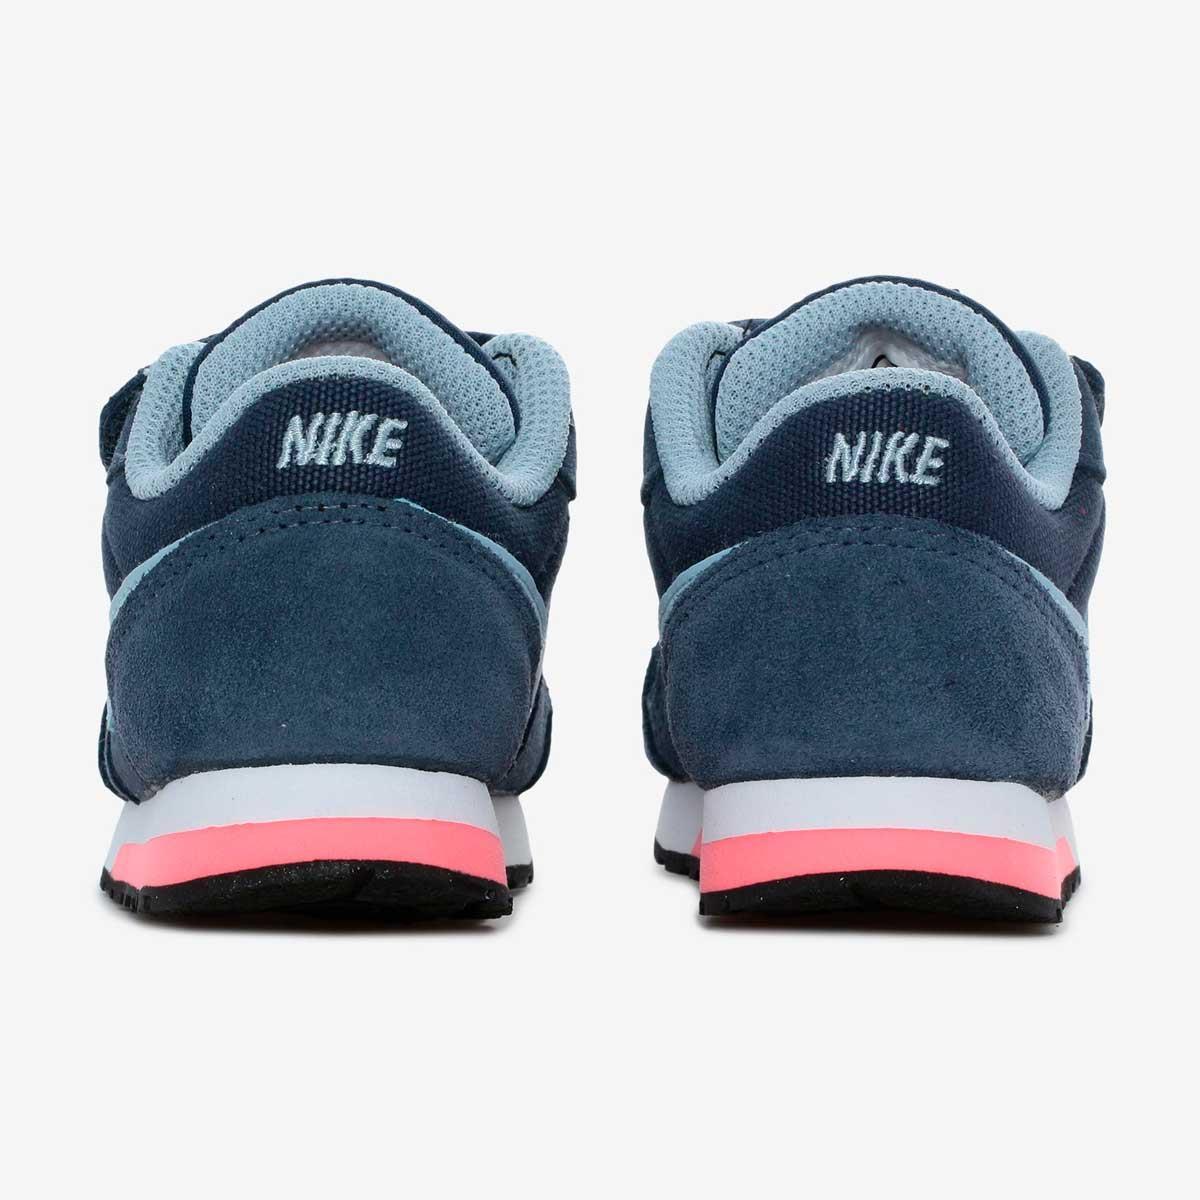 fc80f5e04aed0 Tênis Nike Md Runner 2 TD Infantil